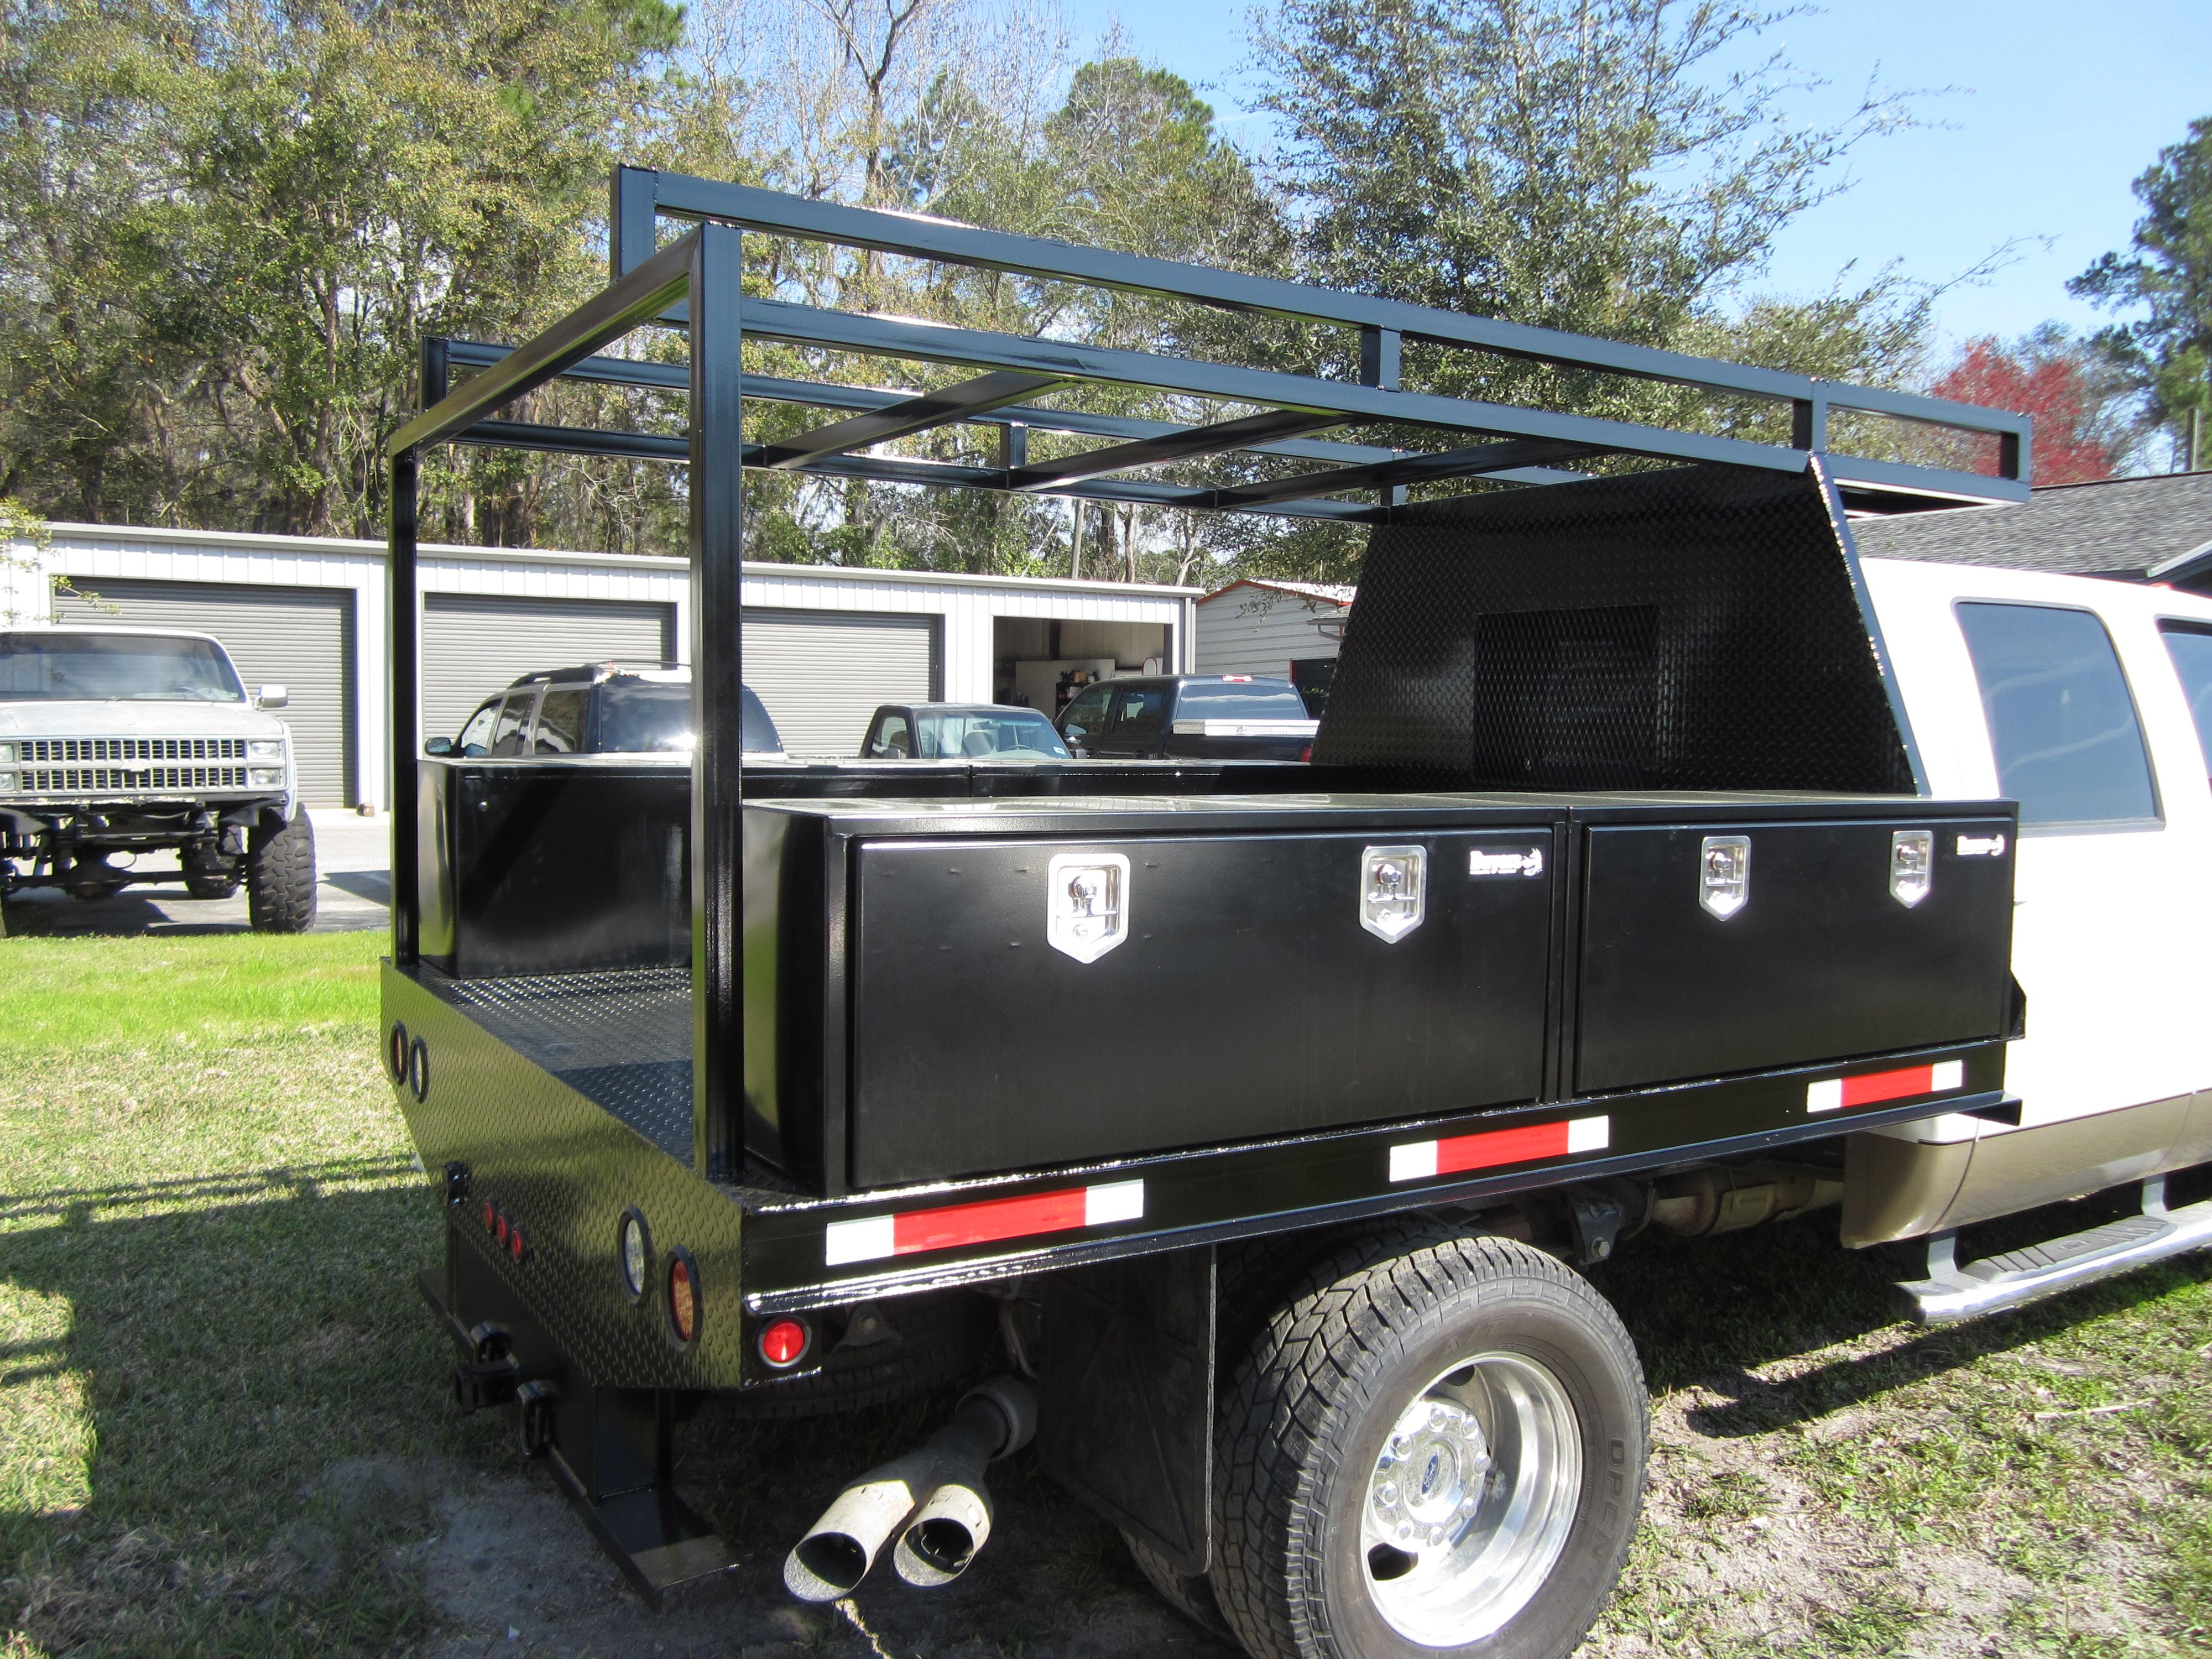 Truck Beds For Sale Er Mounted Dodge Cm Truck Beds Pronghorn 8600ut Really Nice Storage